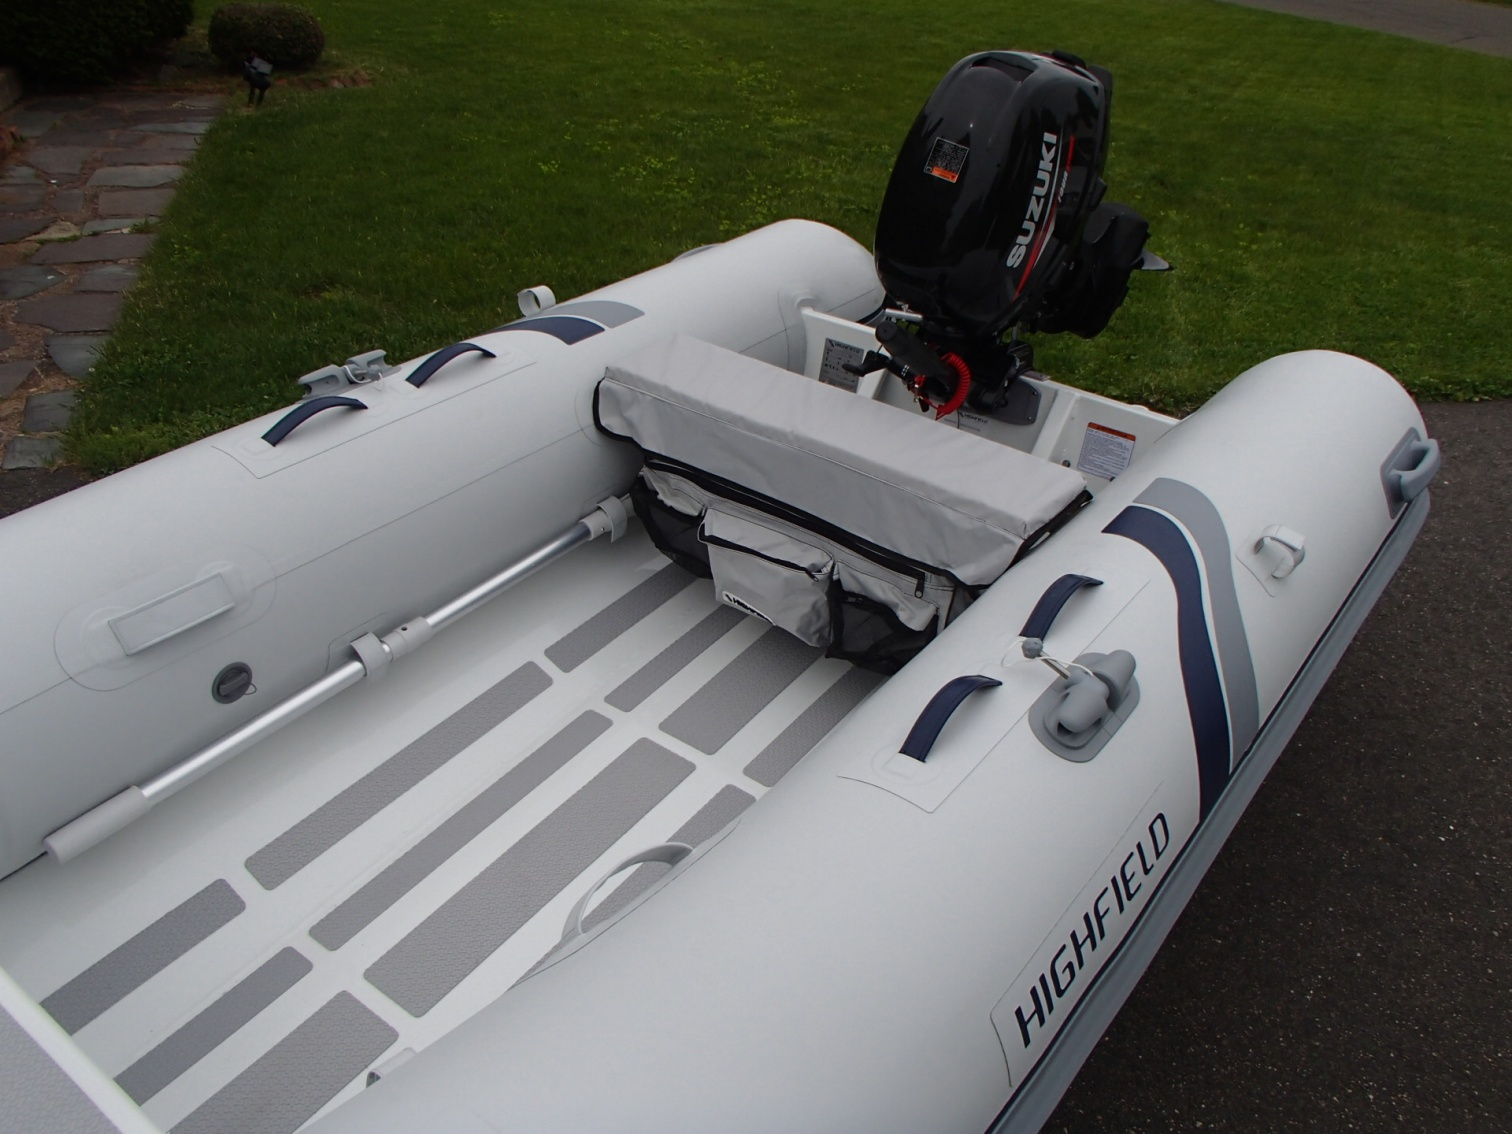 Fiberglass vs Aluminum for RIB Dinghy? - Cruisers & Sailing